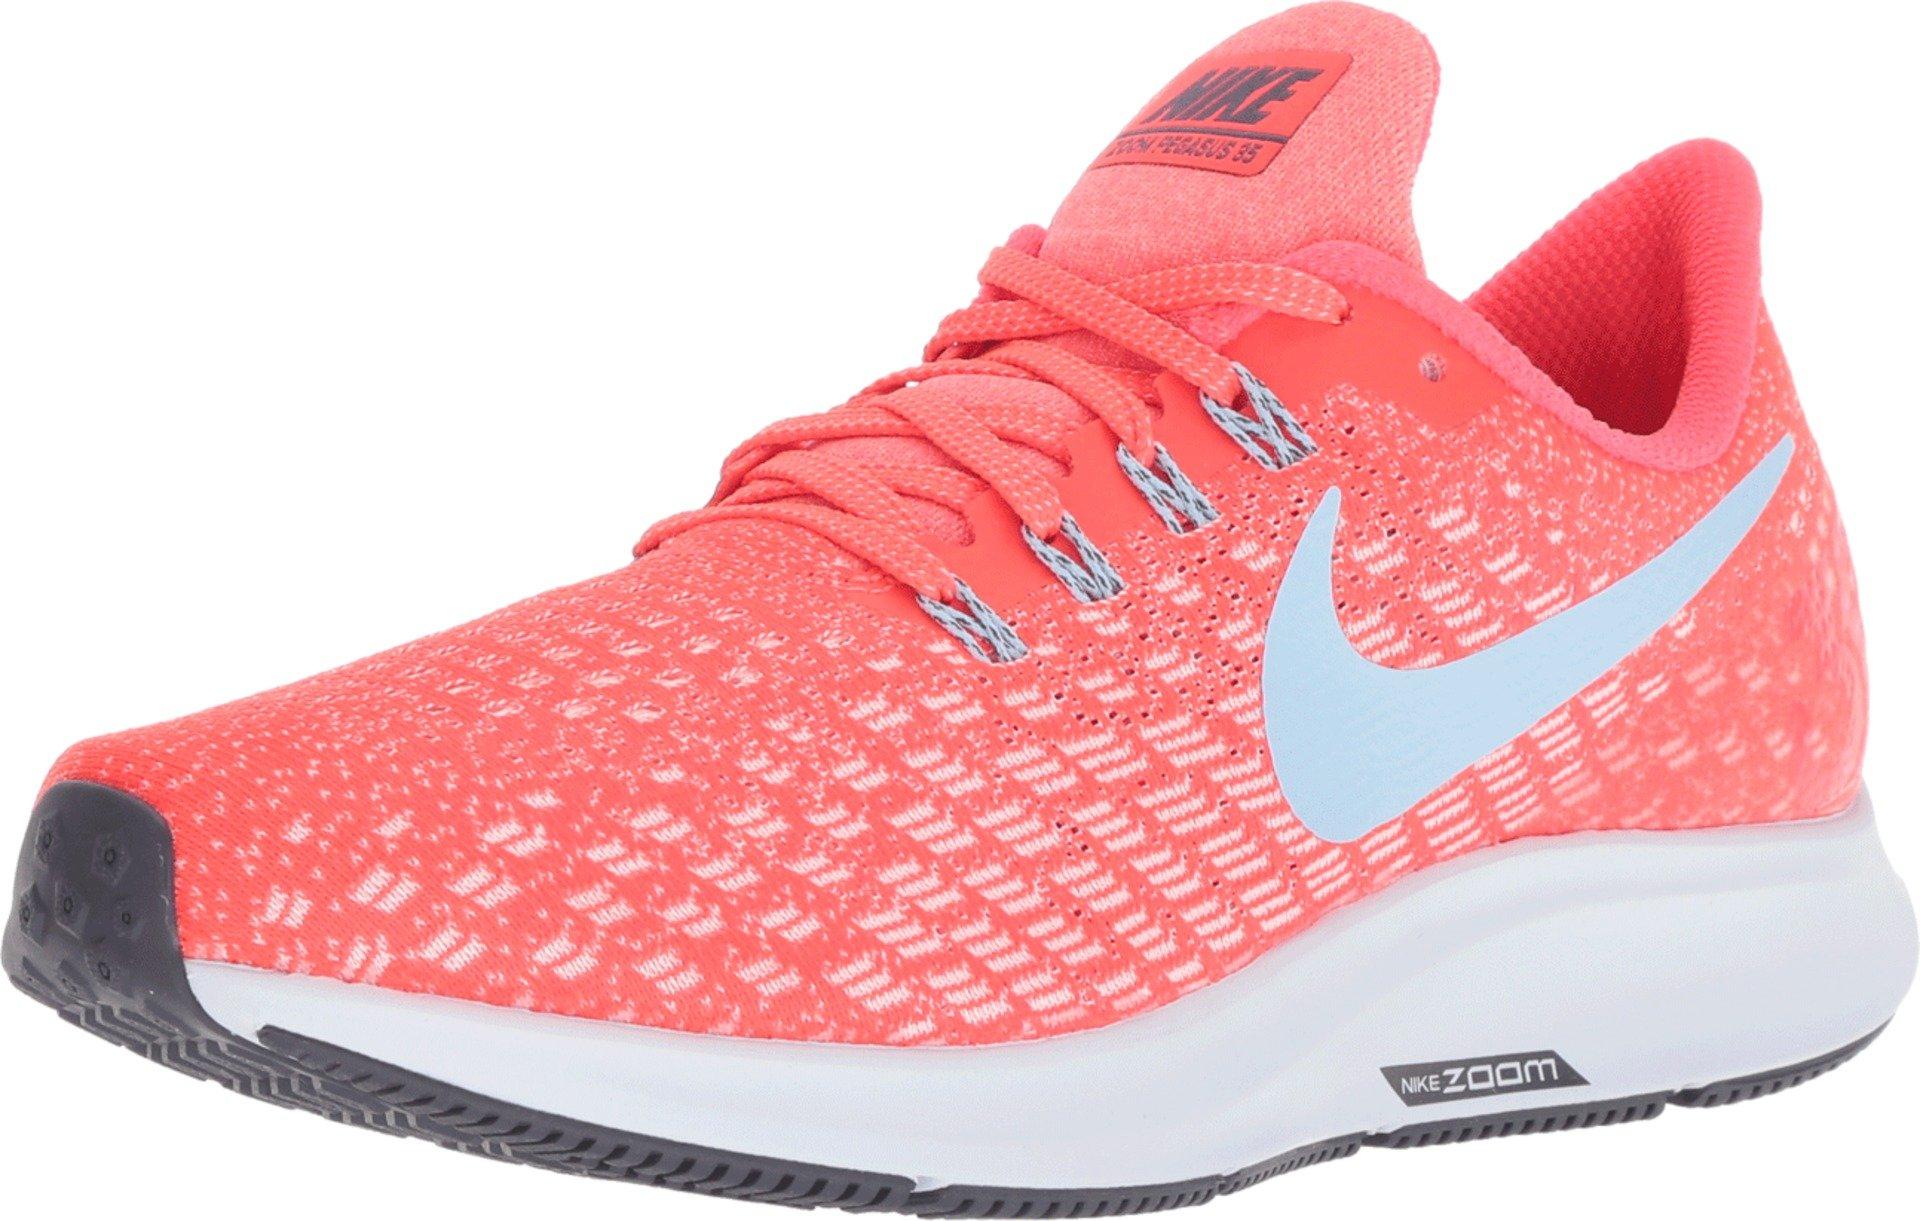 324108f17 Nike Women's Air Zoom Pegasus 35 Running Shoes (12 B(M) US, Bright Crimson/Ice  Blue/Sail)